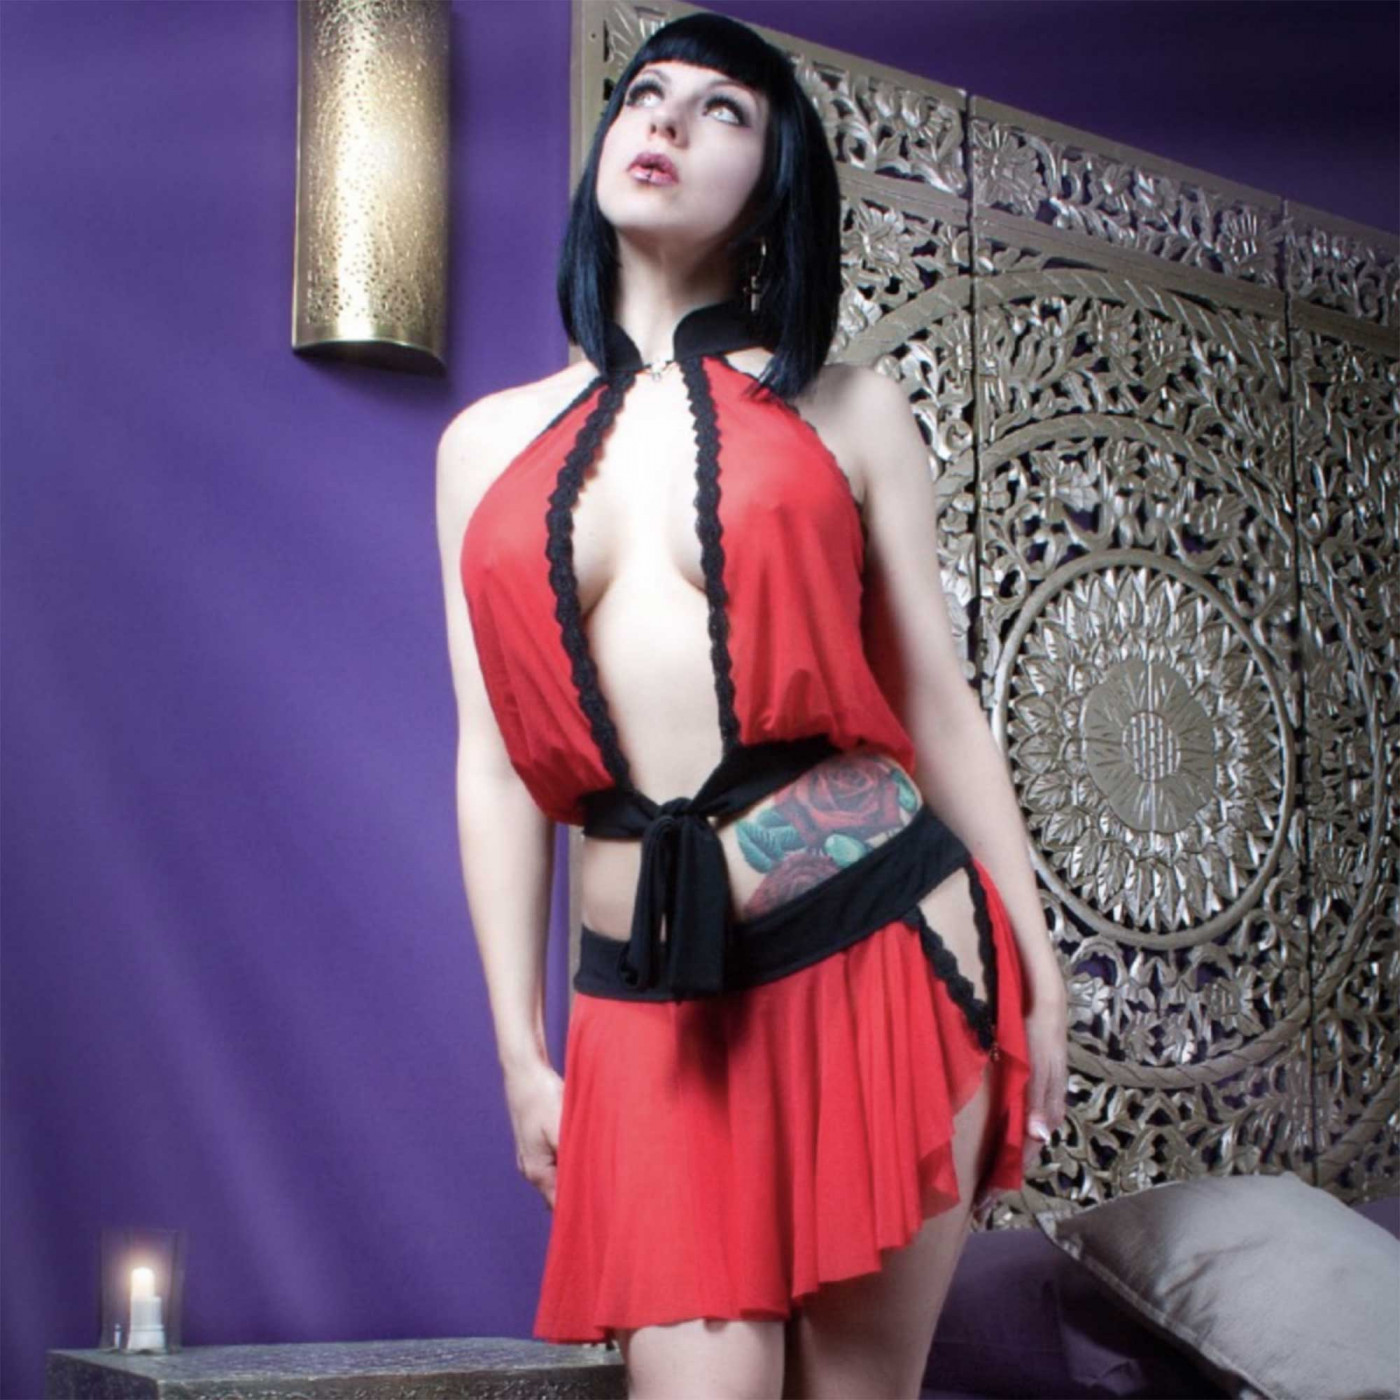 Elia, ensemble sexy en résille rouge - Patrice Catanzaro